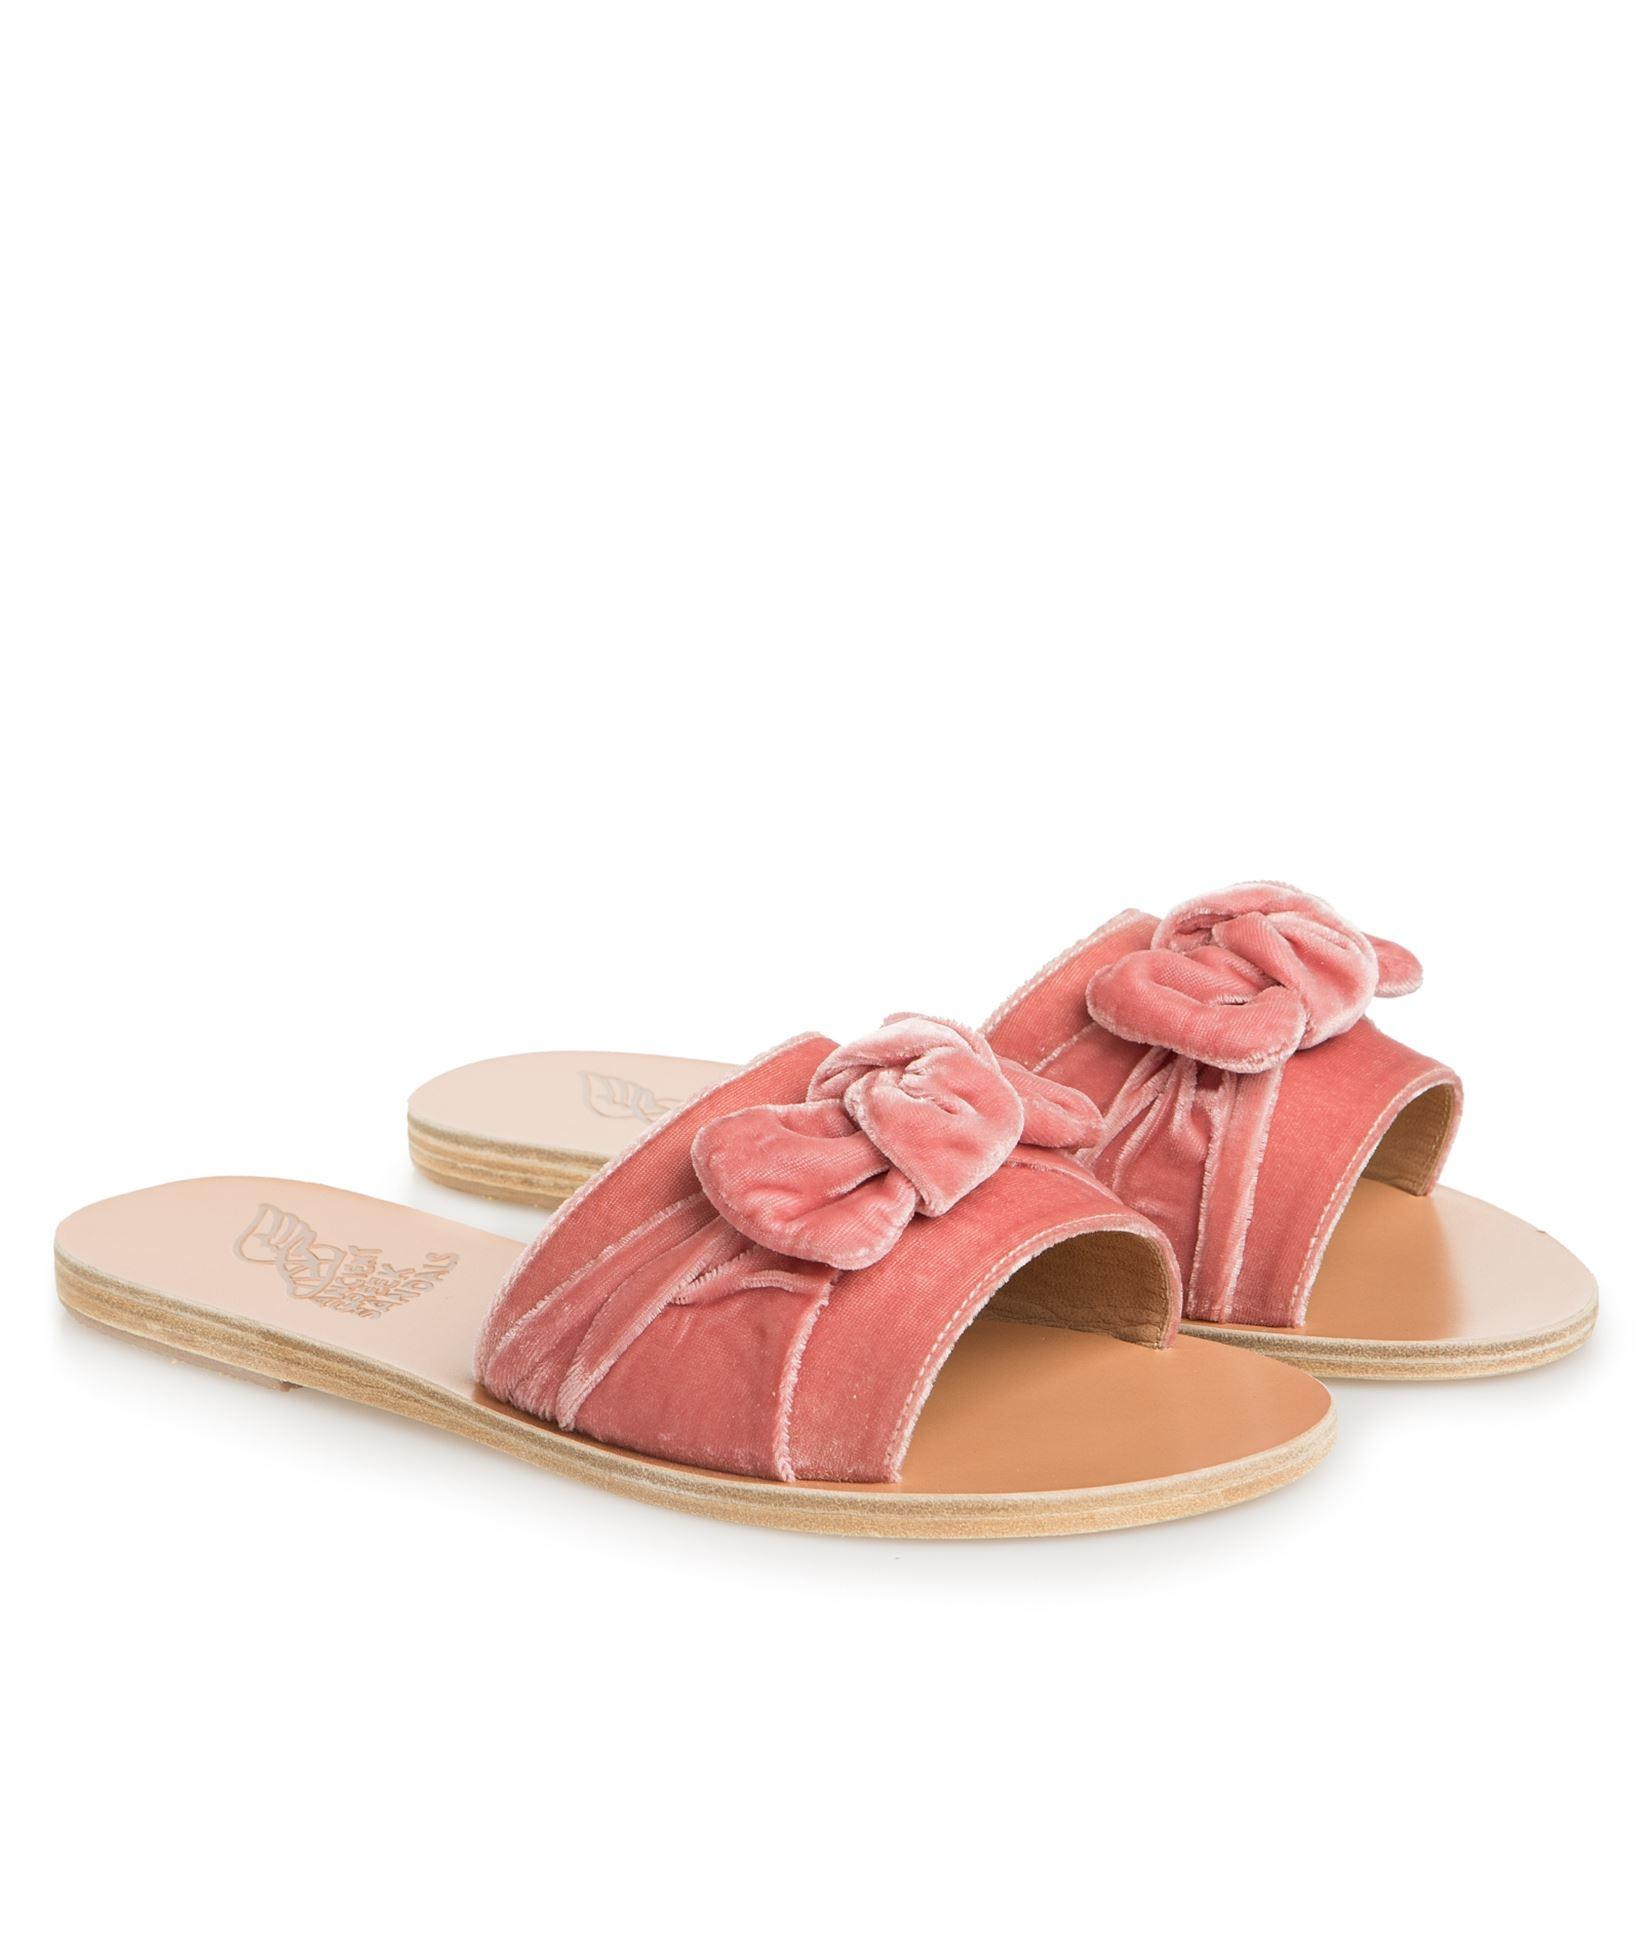 0ad20b420b07 Ancient Greek Sandals Dusty Rose Velvet Bow Taygete Slides ...